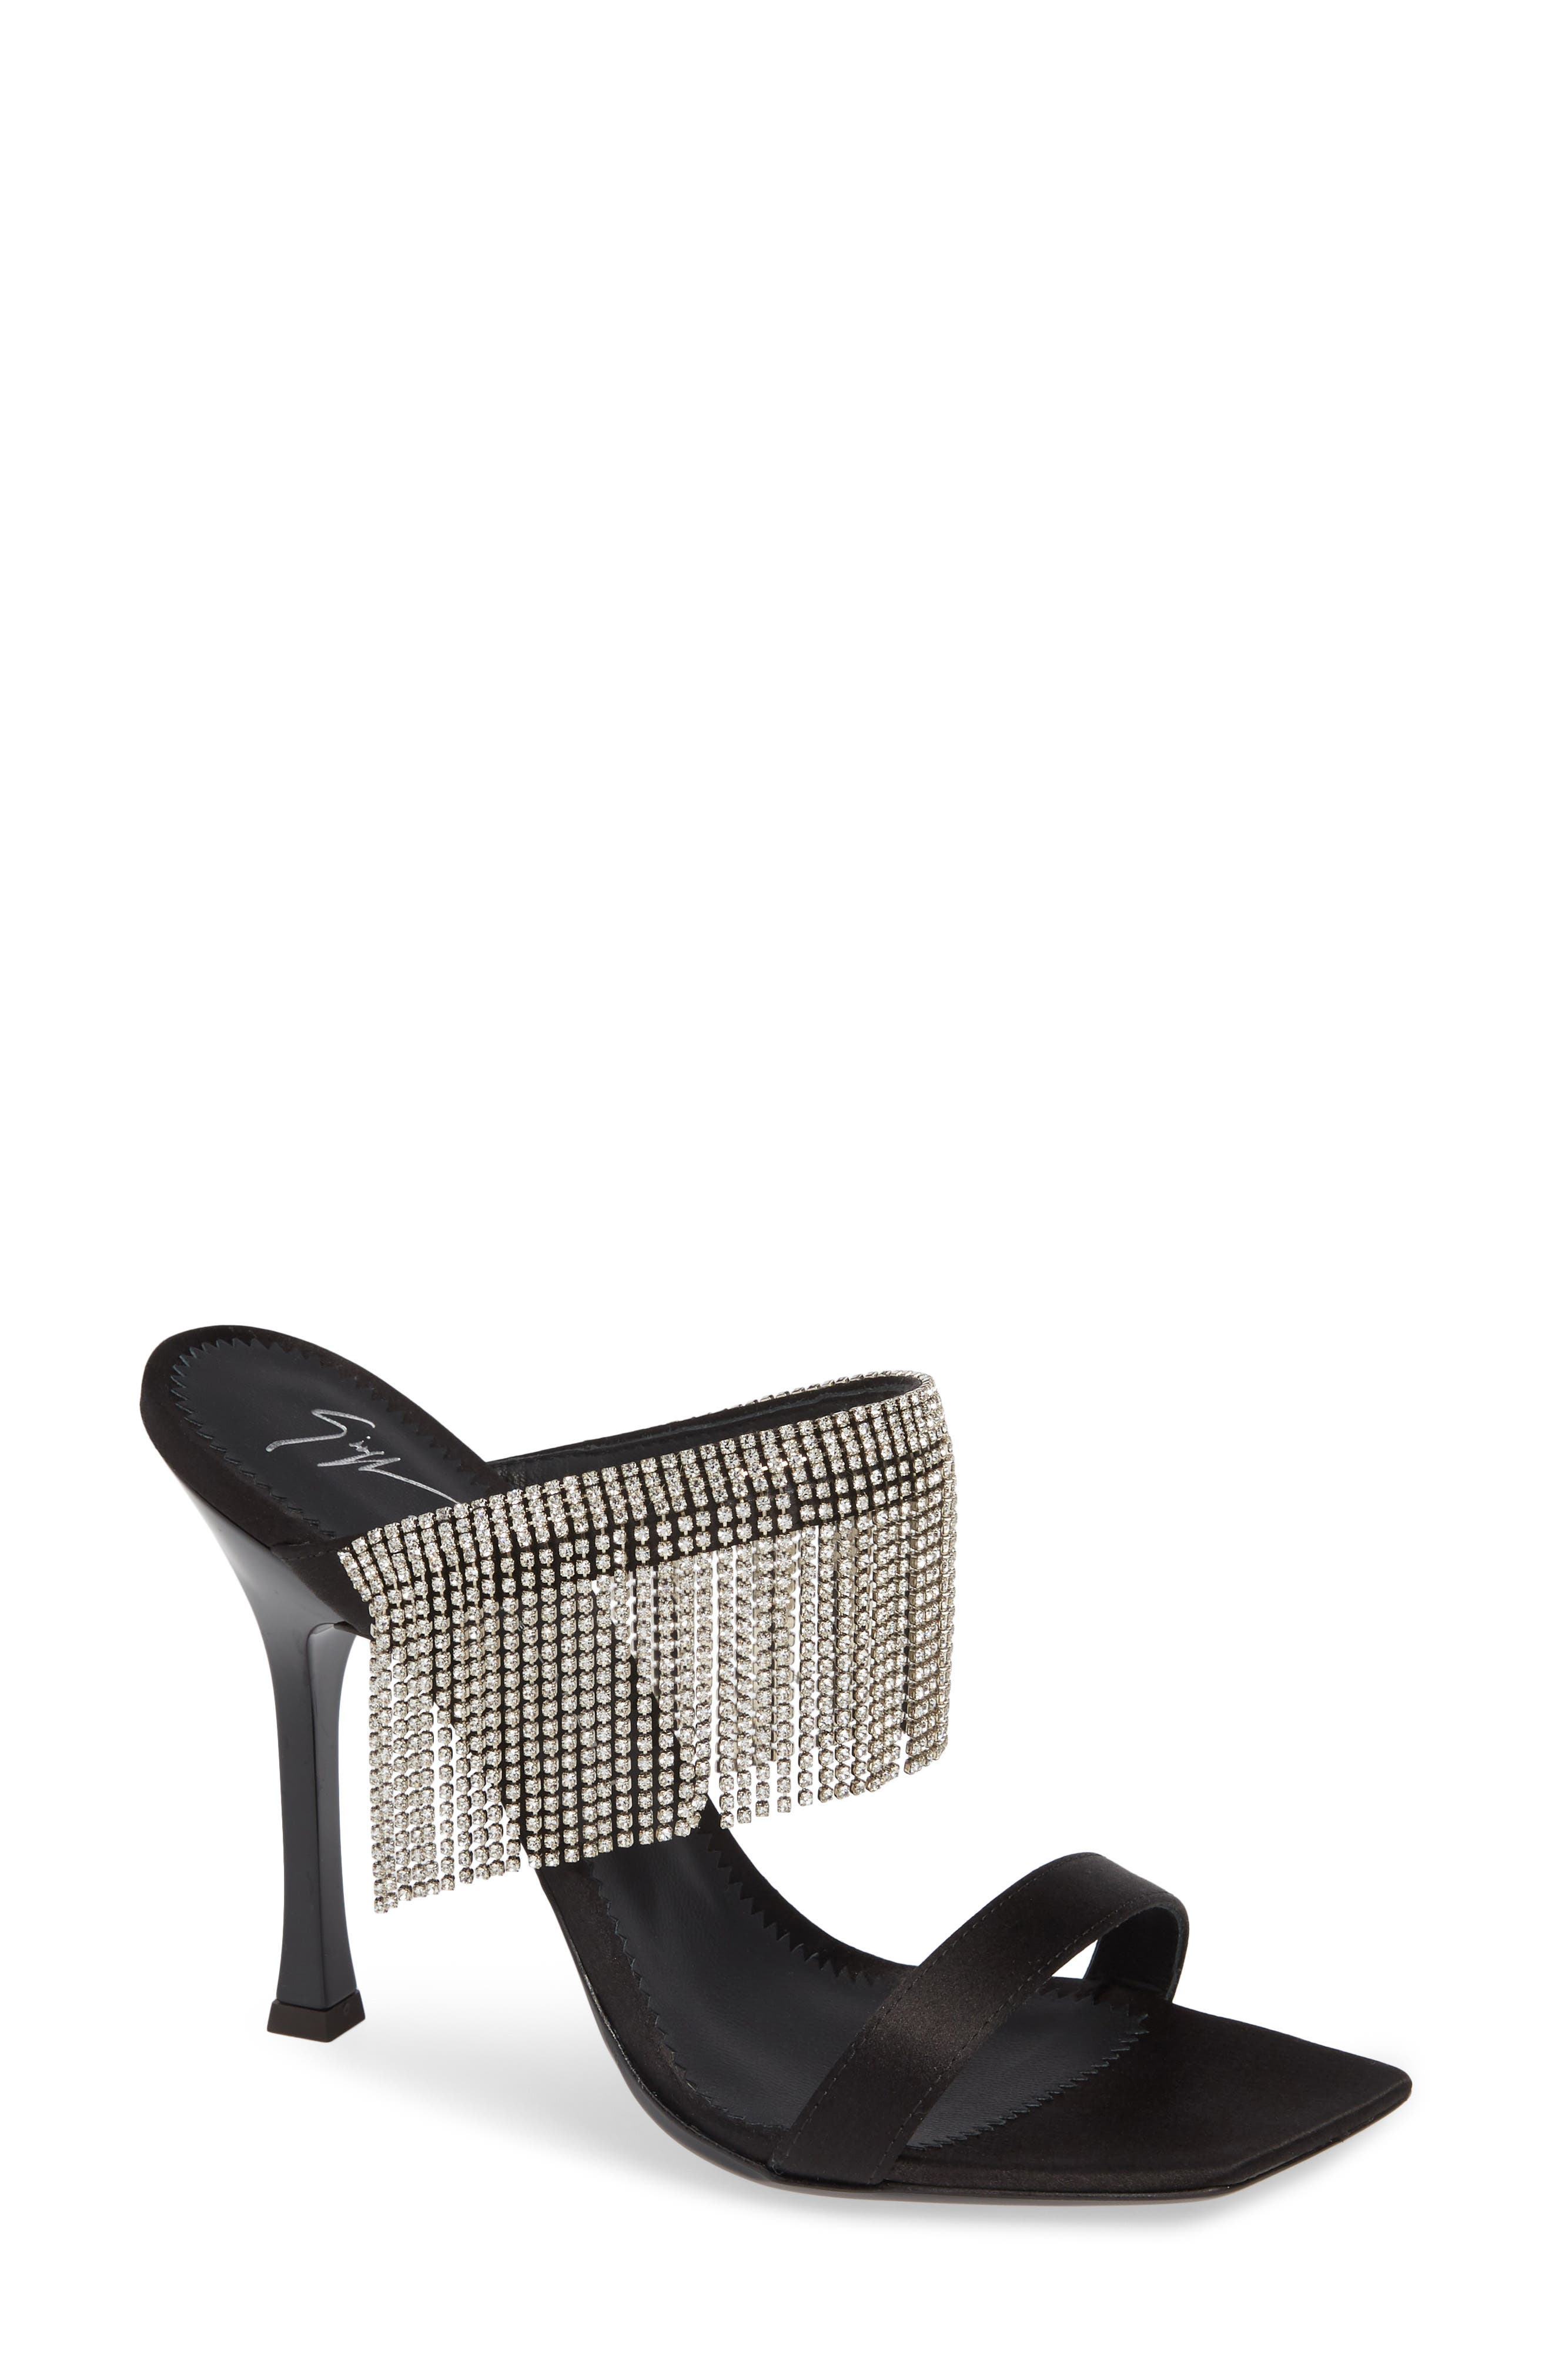 Swarovski Crystal Fringe Sandal,                             Main thumbnail 1, color,                             BLACK